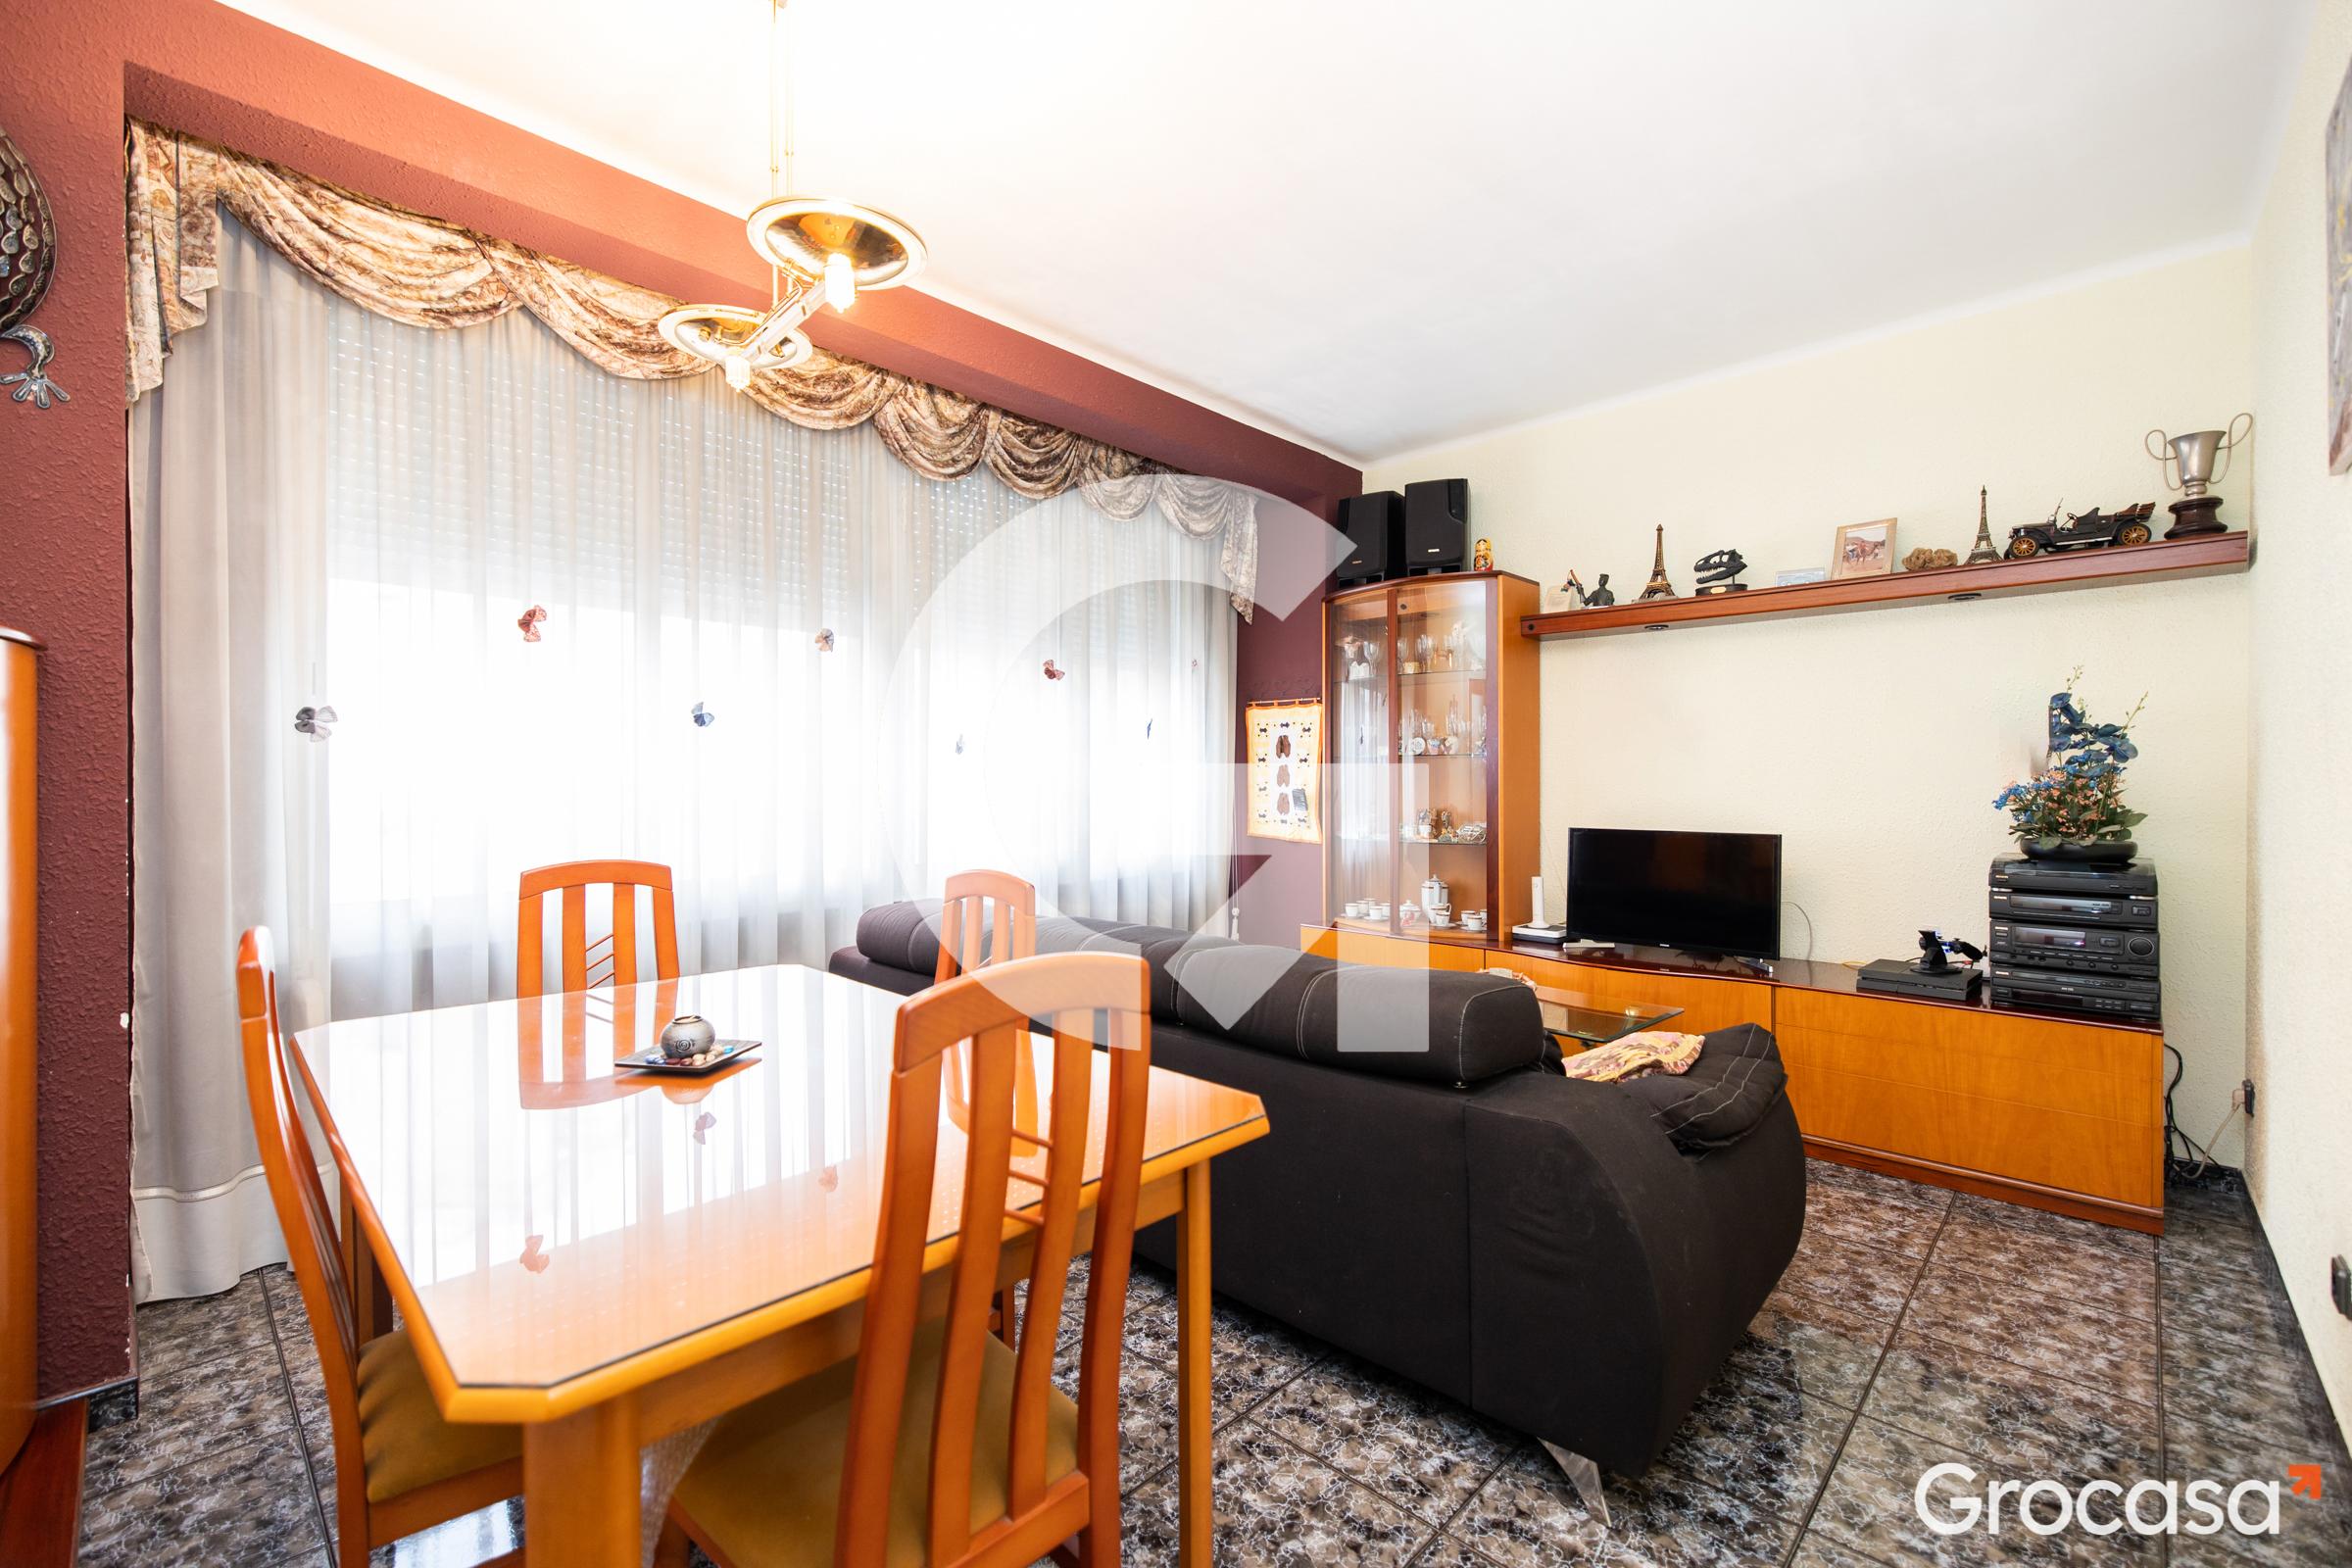 Piso en Vinyets moli vell en Sant Boi de Llobregat en Venta por 162.000€